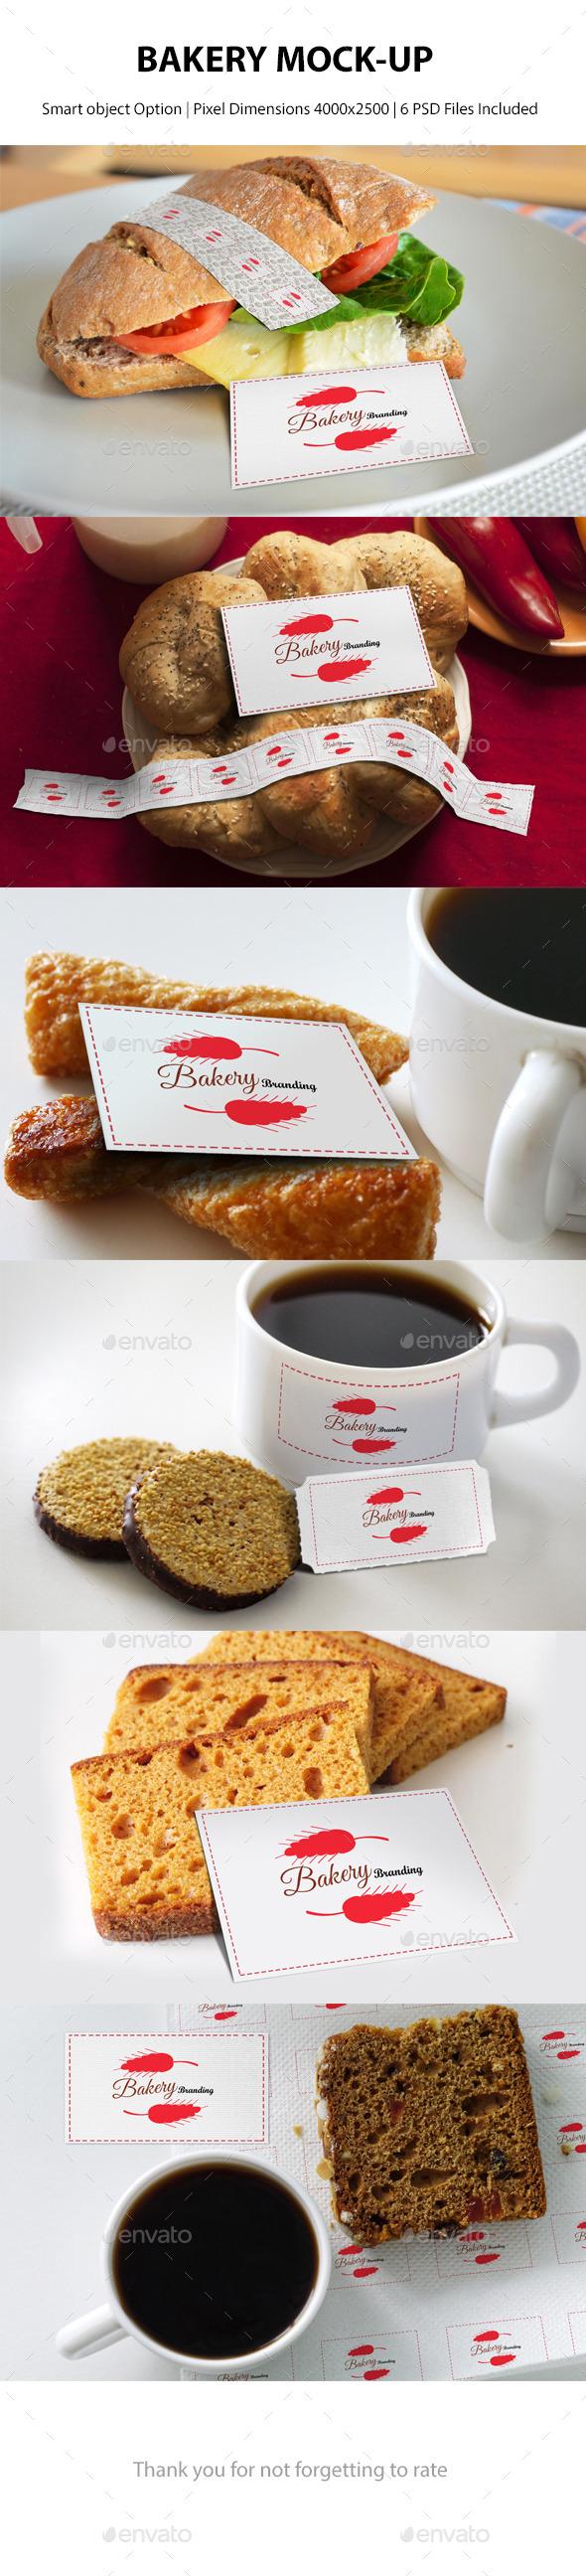 GraphicRiver Bakery Branding Mockup 9724817